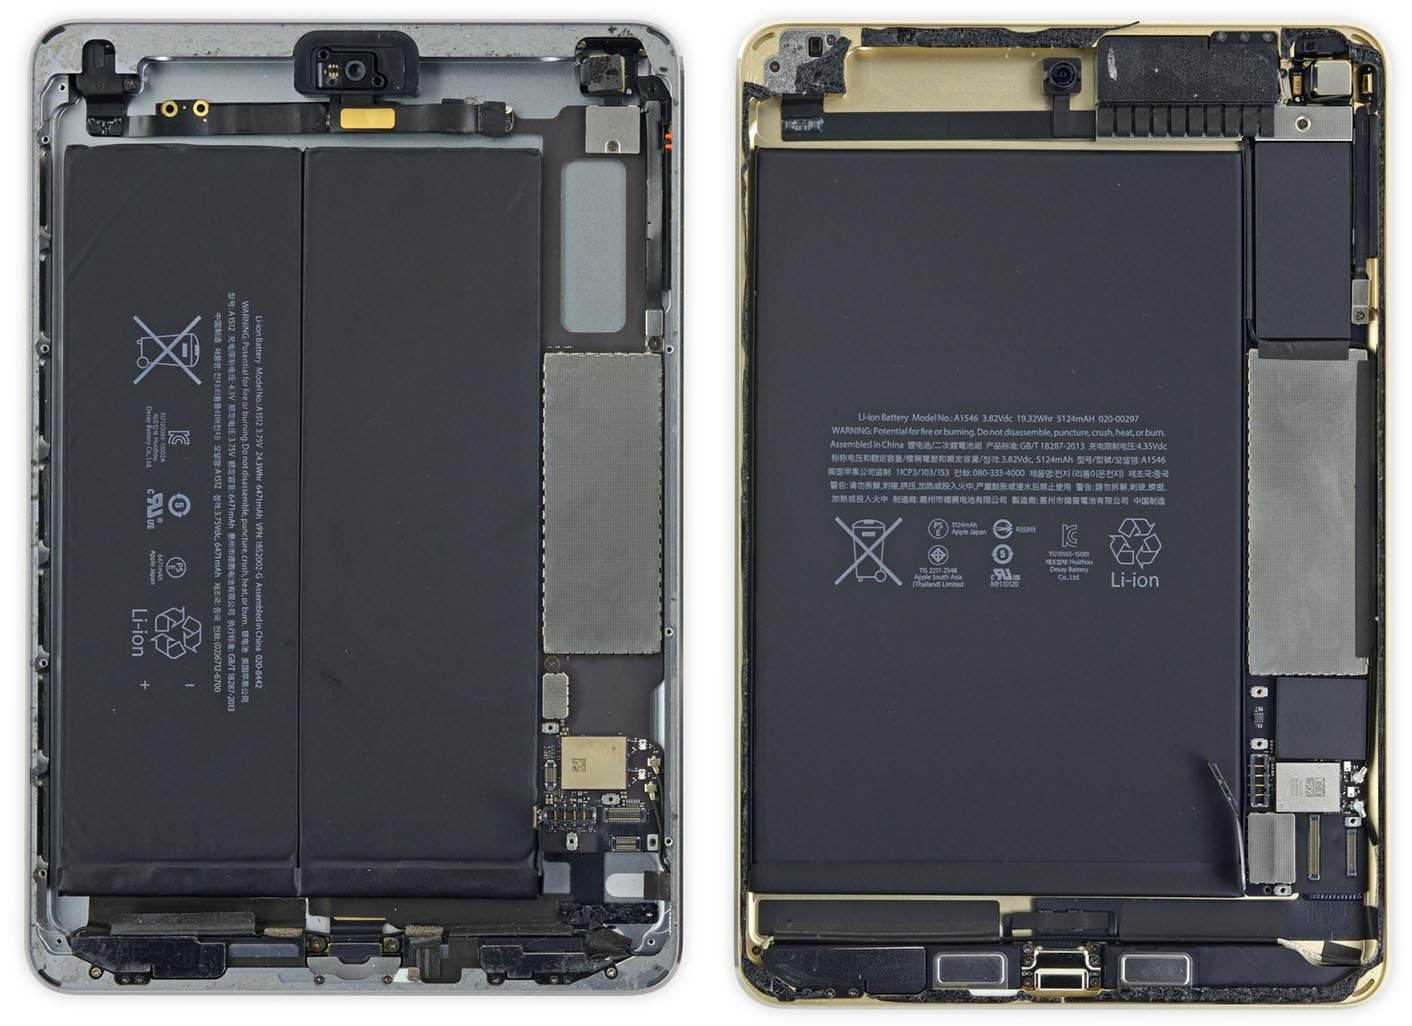 iPad mini batterie iFixit